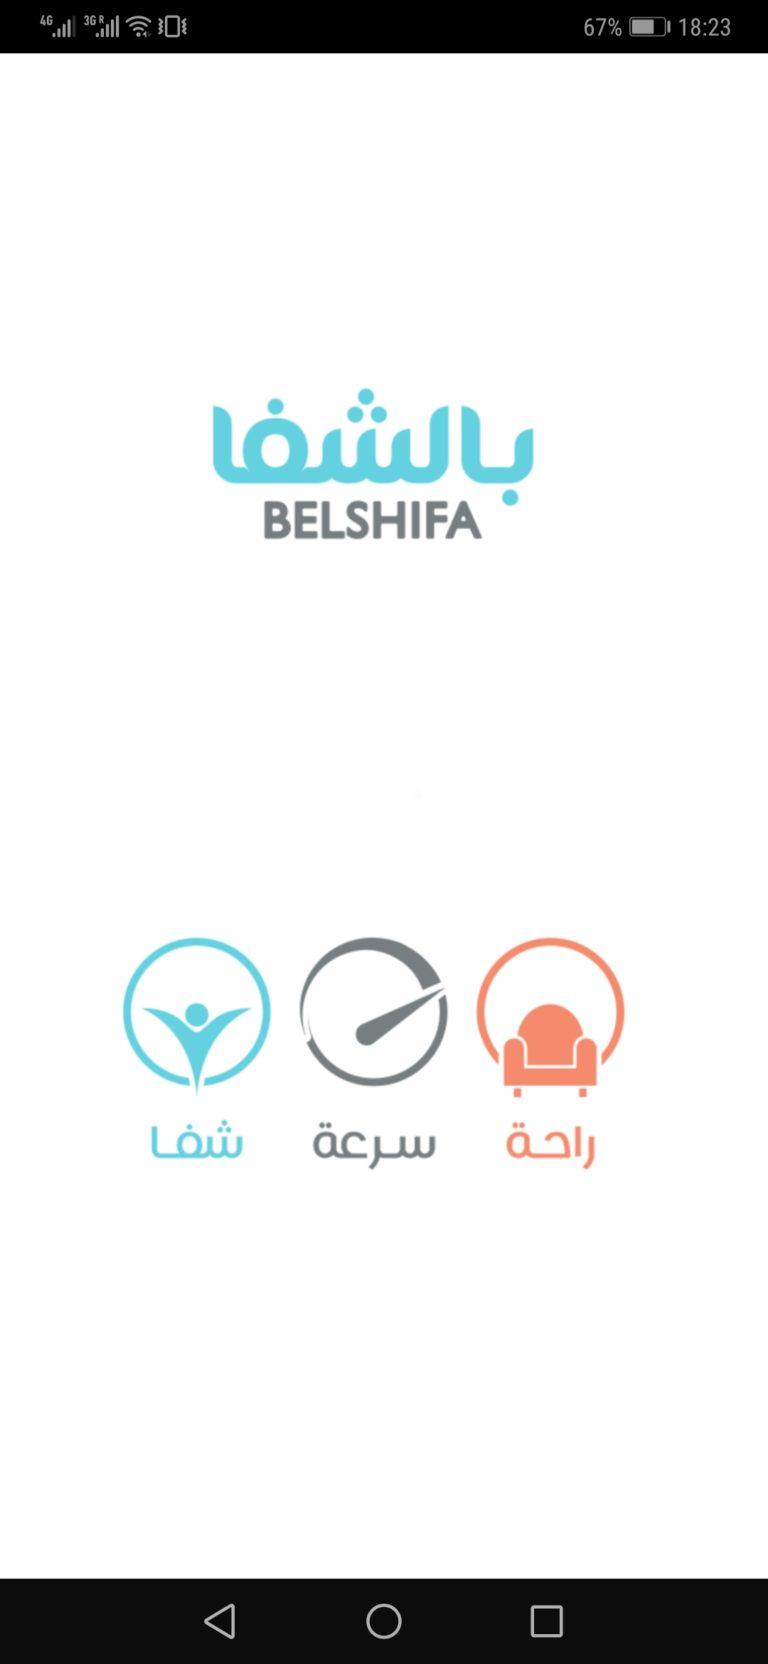 Screenshot_20190222_182316_com.shoppers.belshifapharmacist